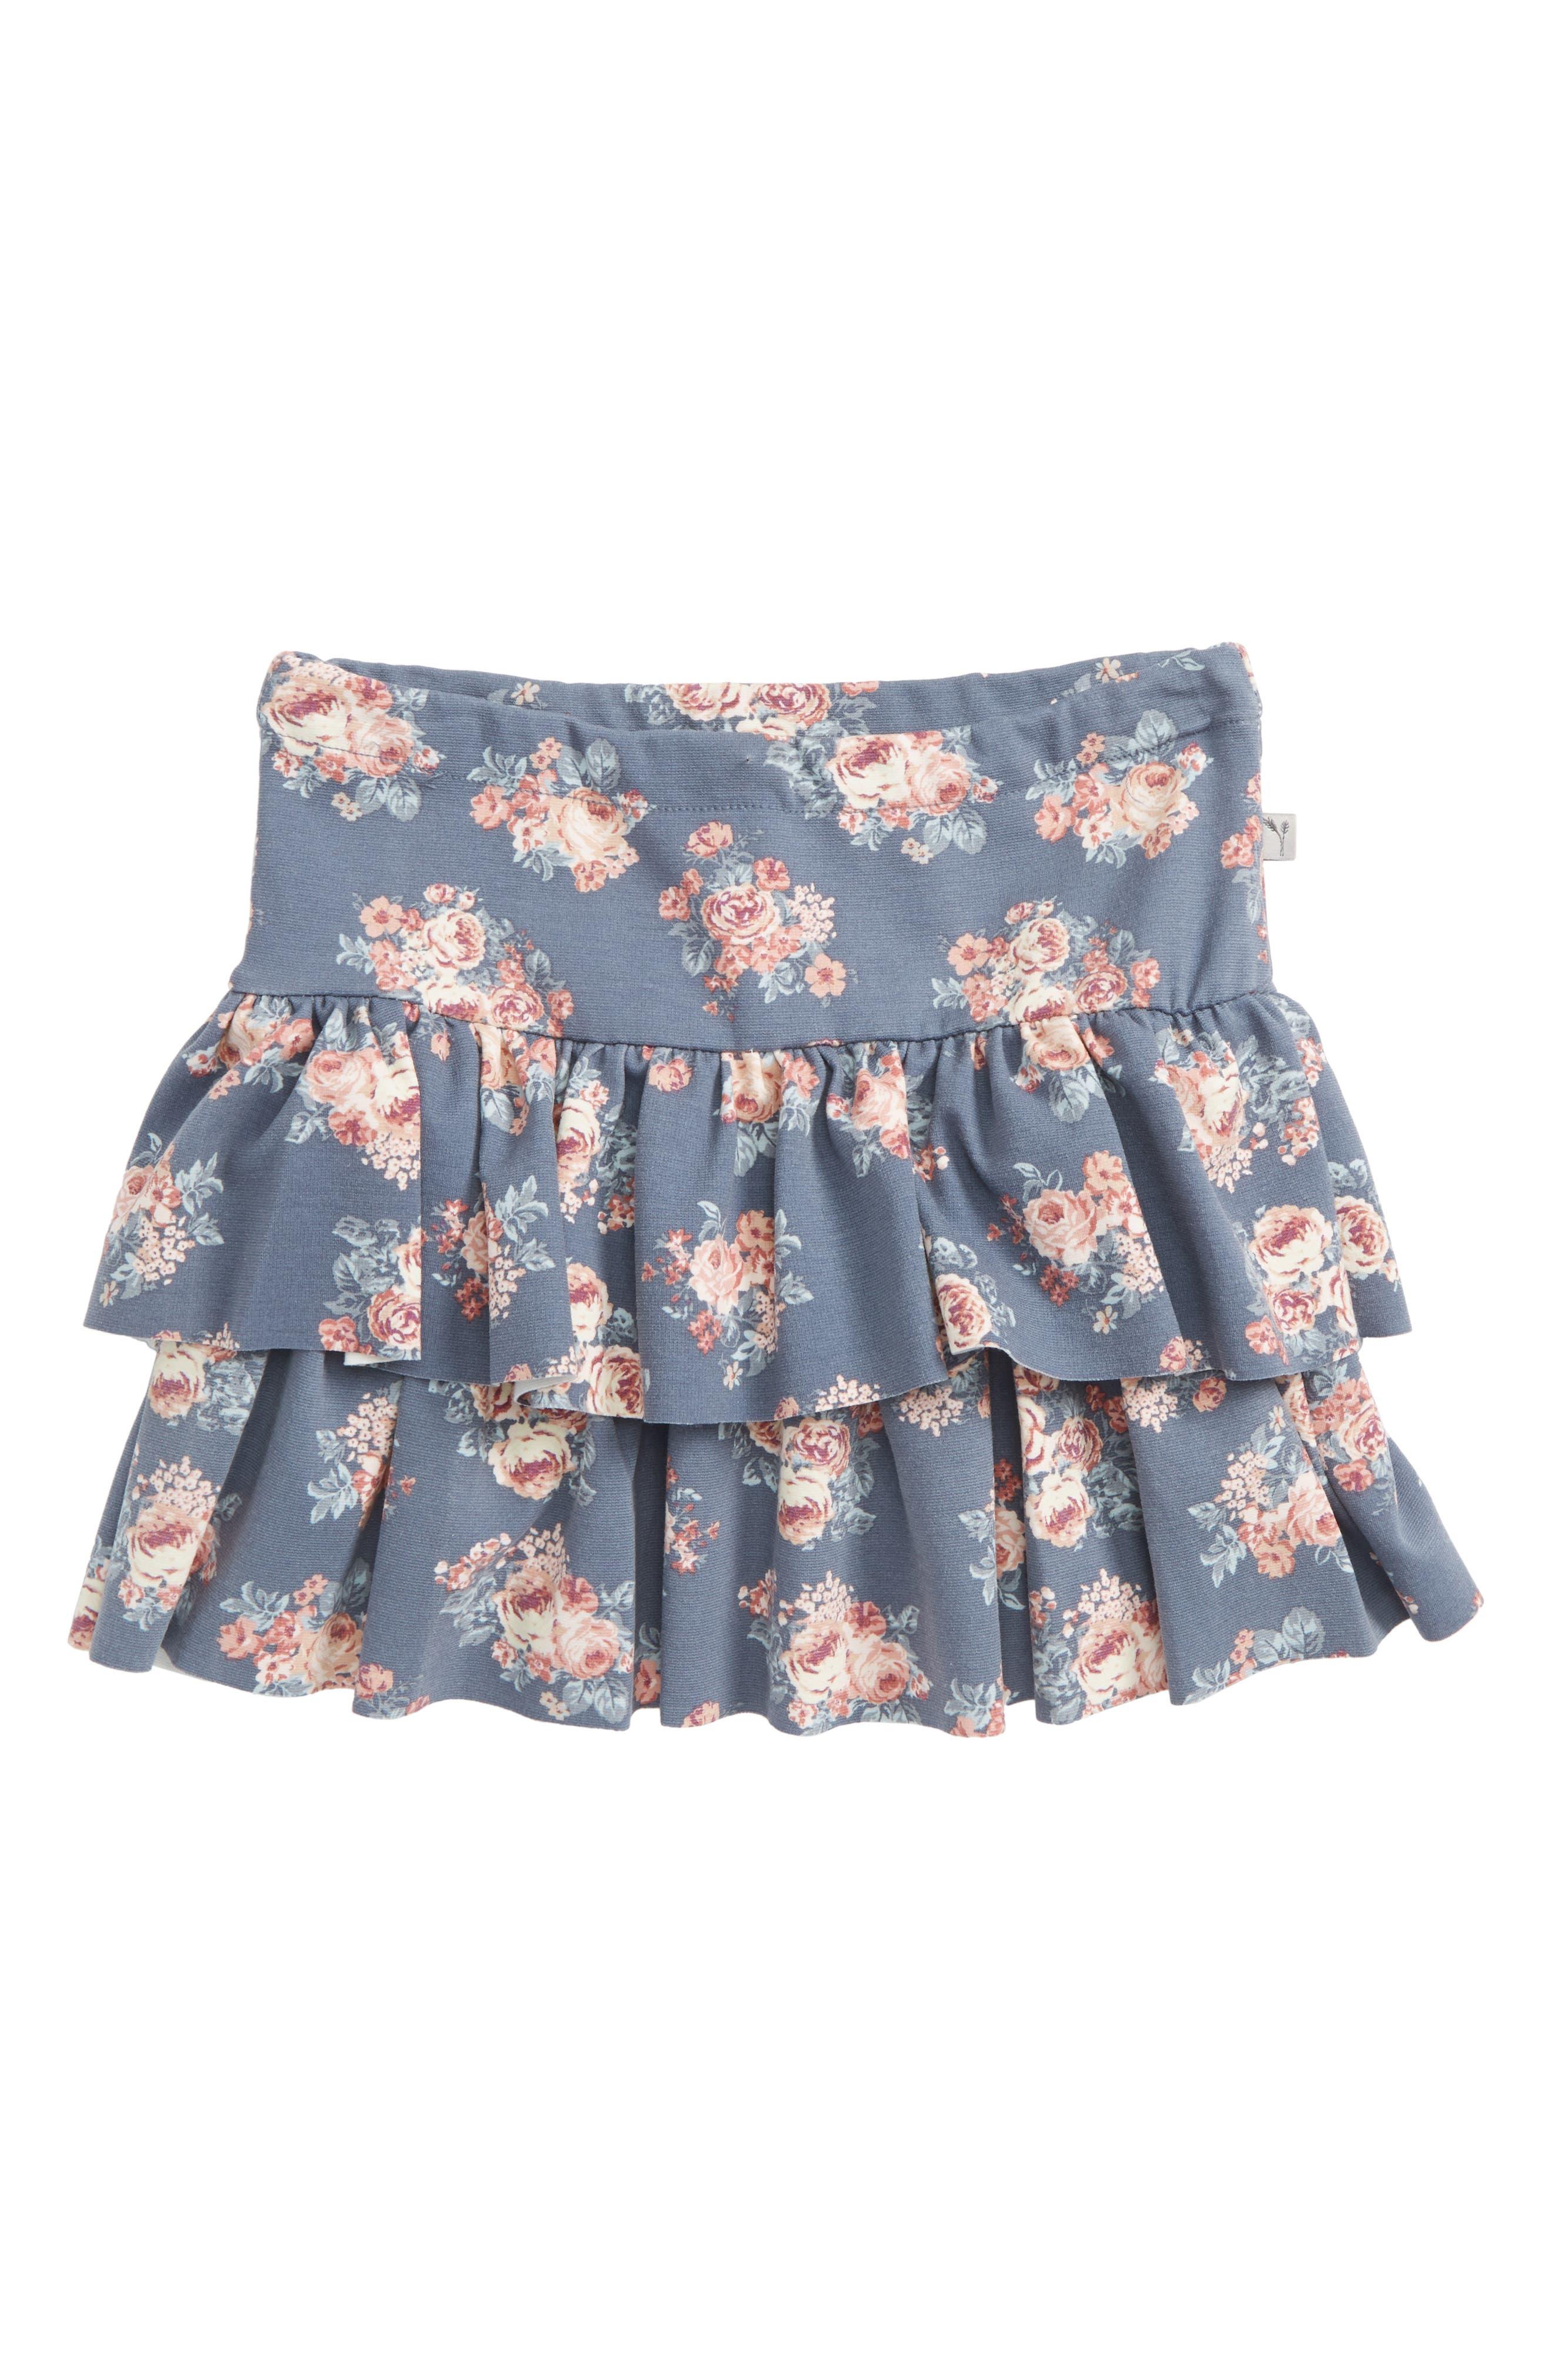 Jersey Ruffle Skirt,                             Main thumbnail 1, color,                             020